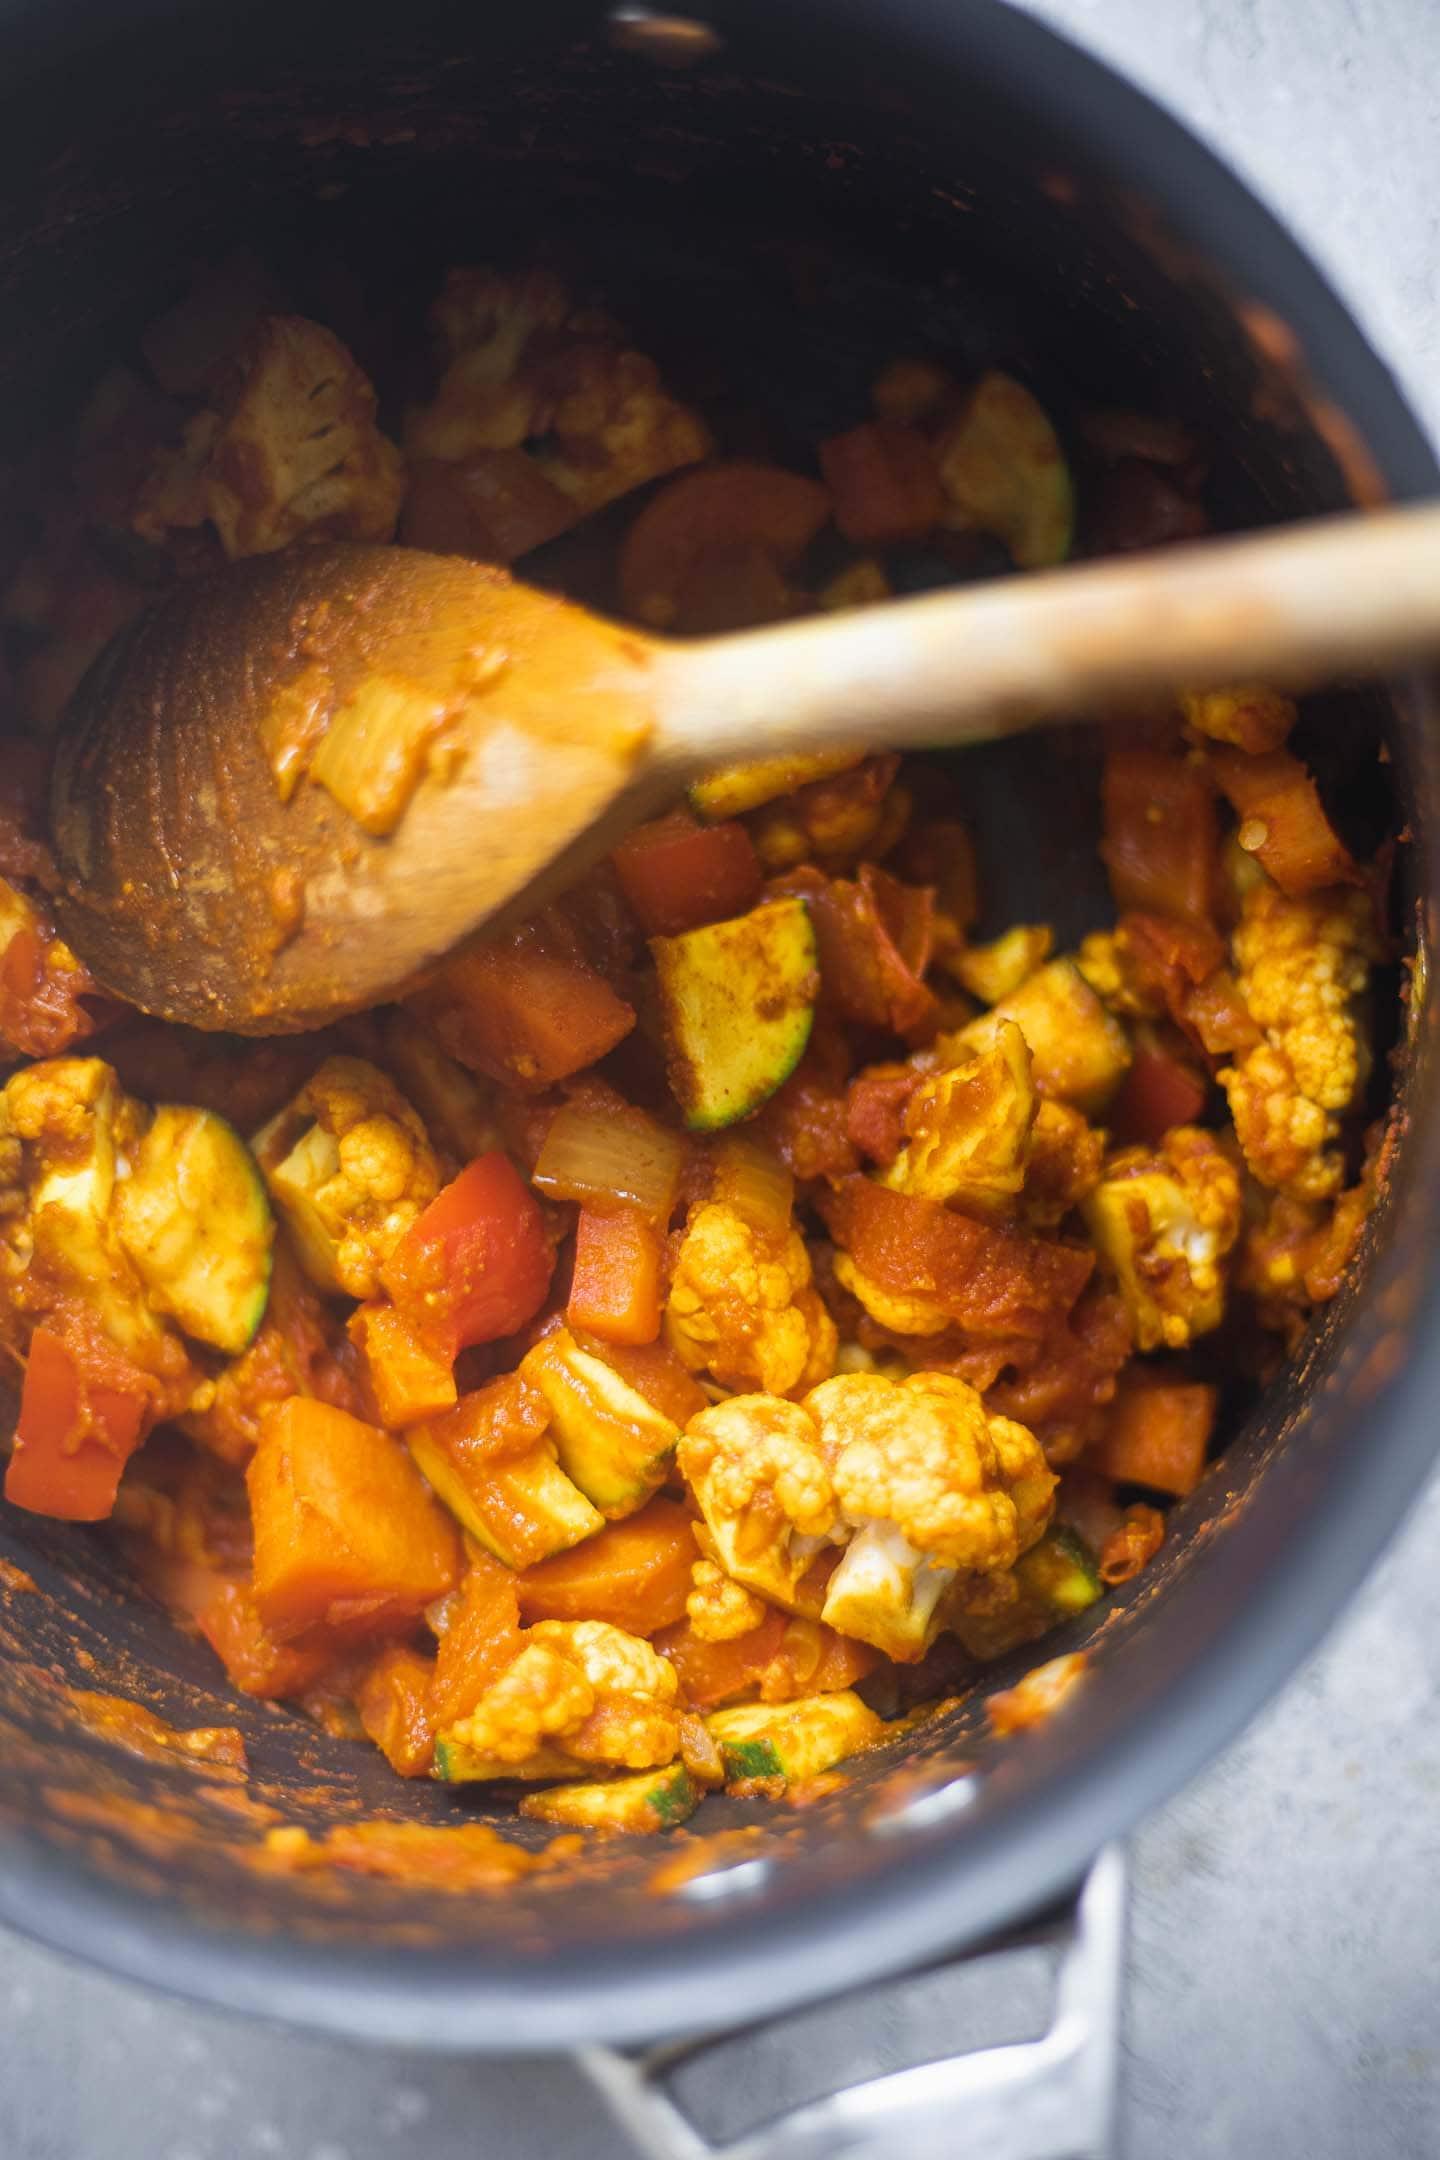 Vegetables in a pan